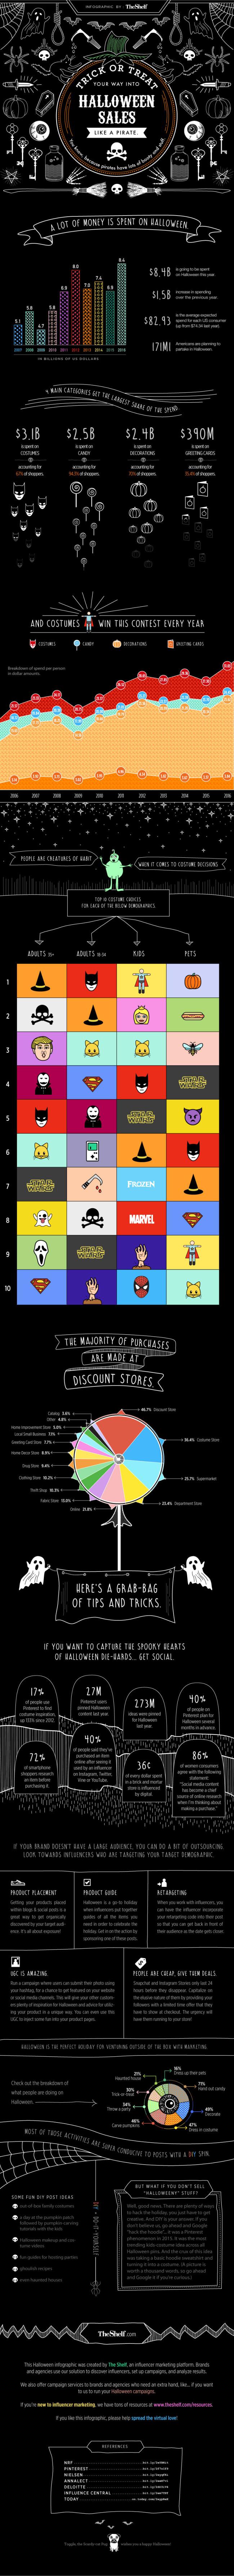 halloween-infographic-the-shelf-e1477581057666